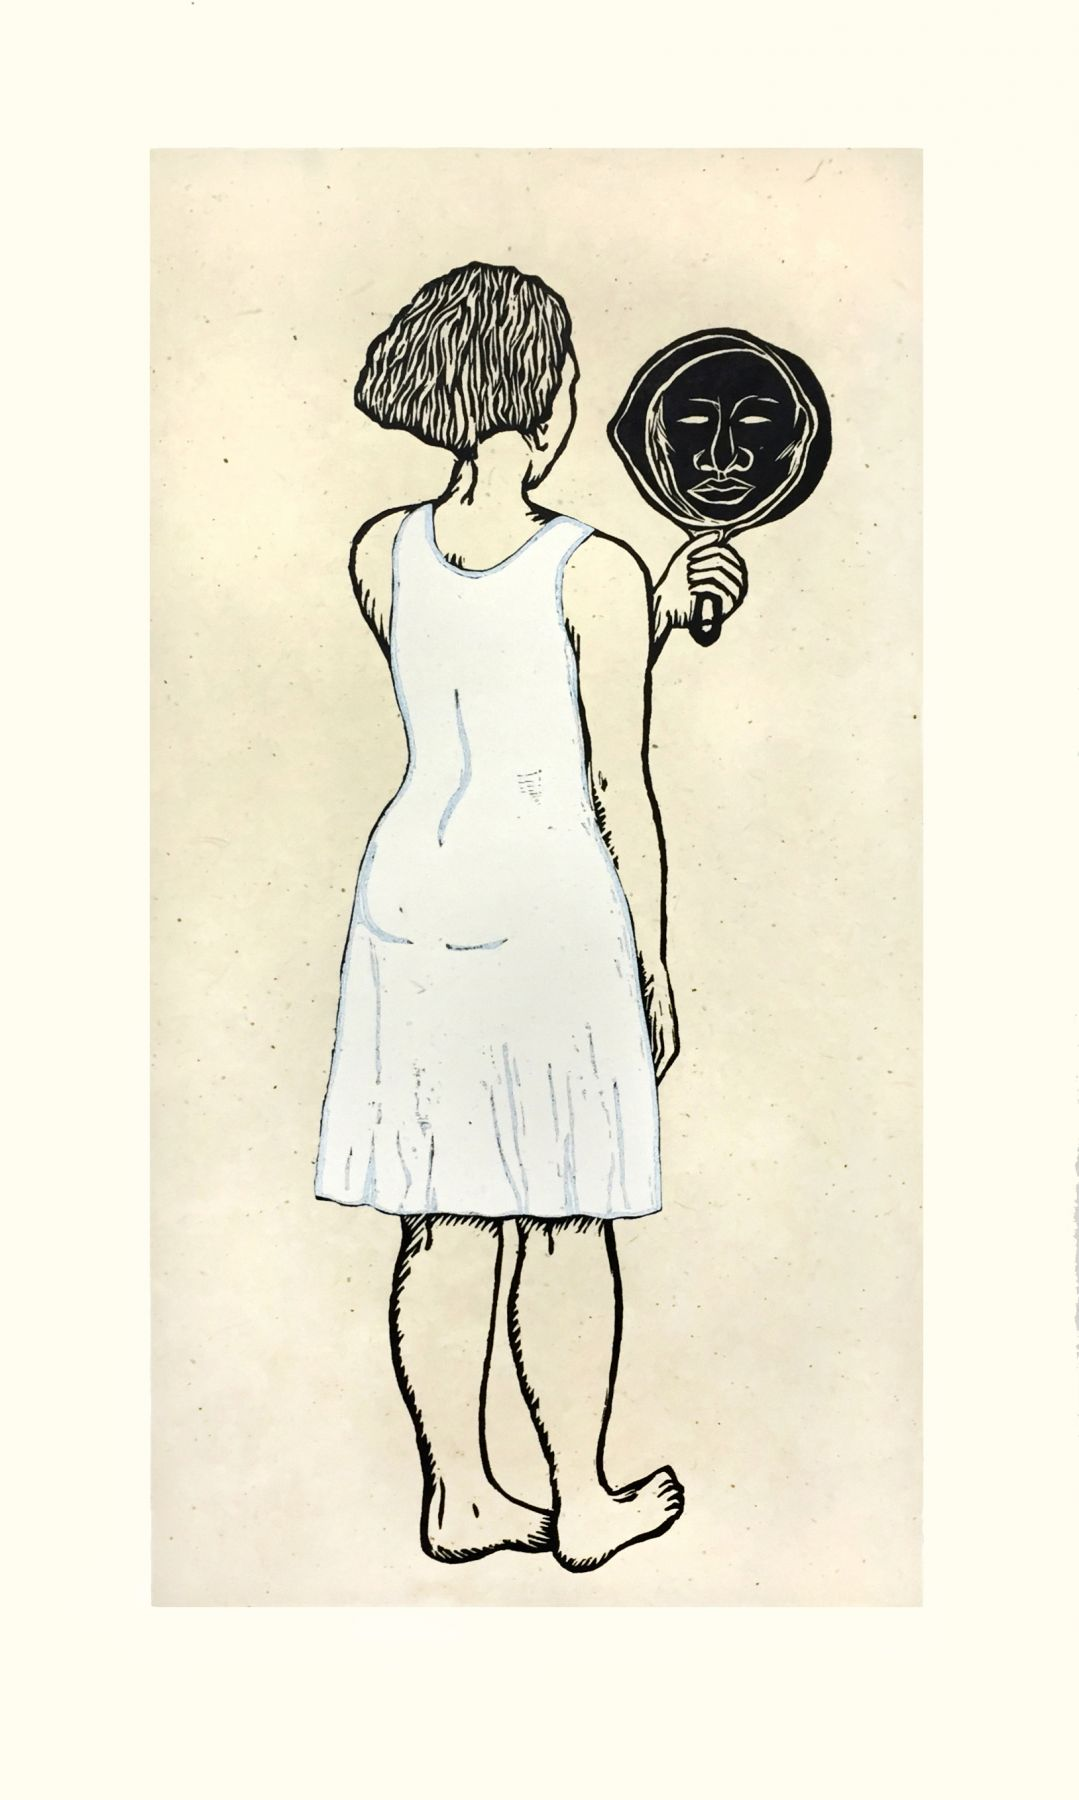 Alison Saar, Mirror, Mirror; Mulatta Seeking Inner Negress II, 2015, woodcut, chine collé, 38 x 21 1/2 inches, Edition 22/30